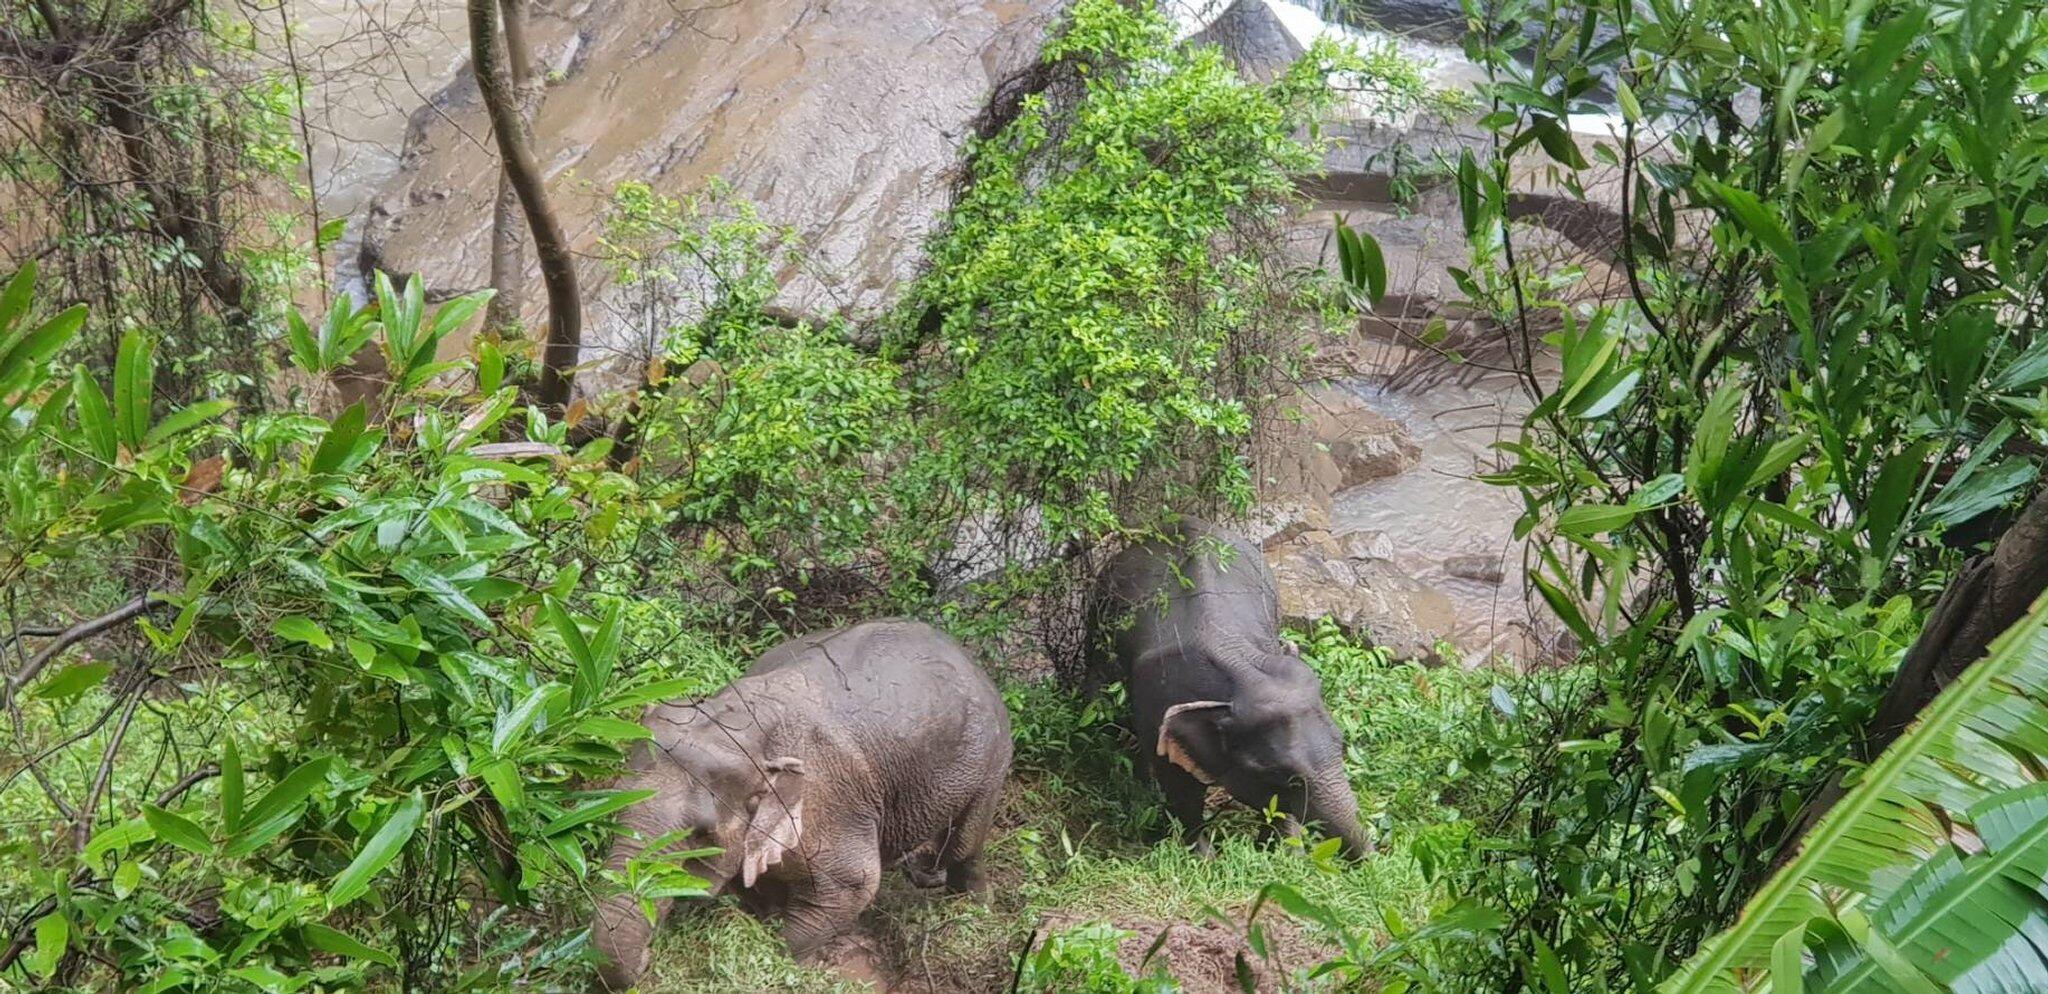 Bild zu Sech Elefanten ertrinken im Wasserfall